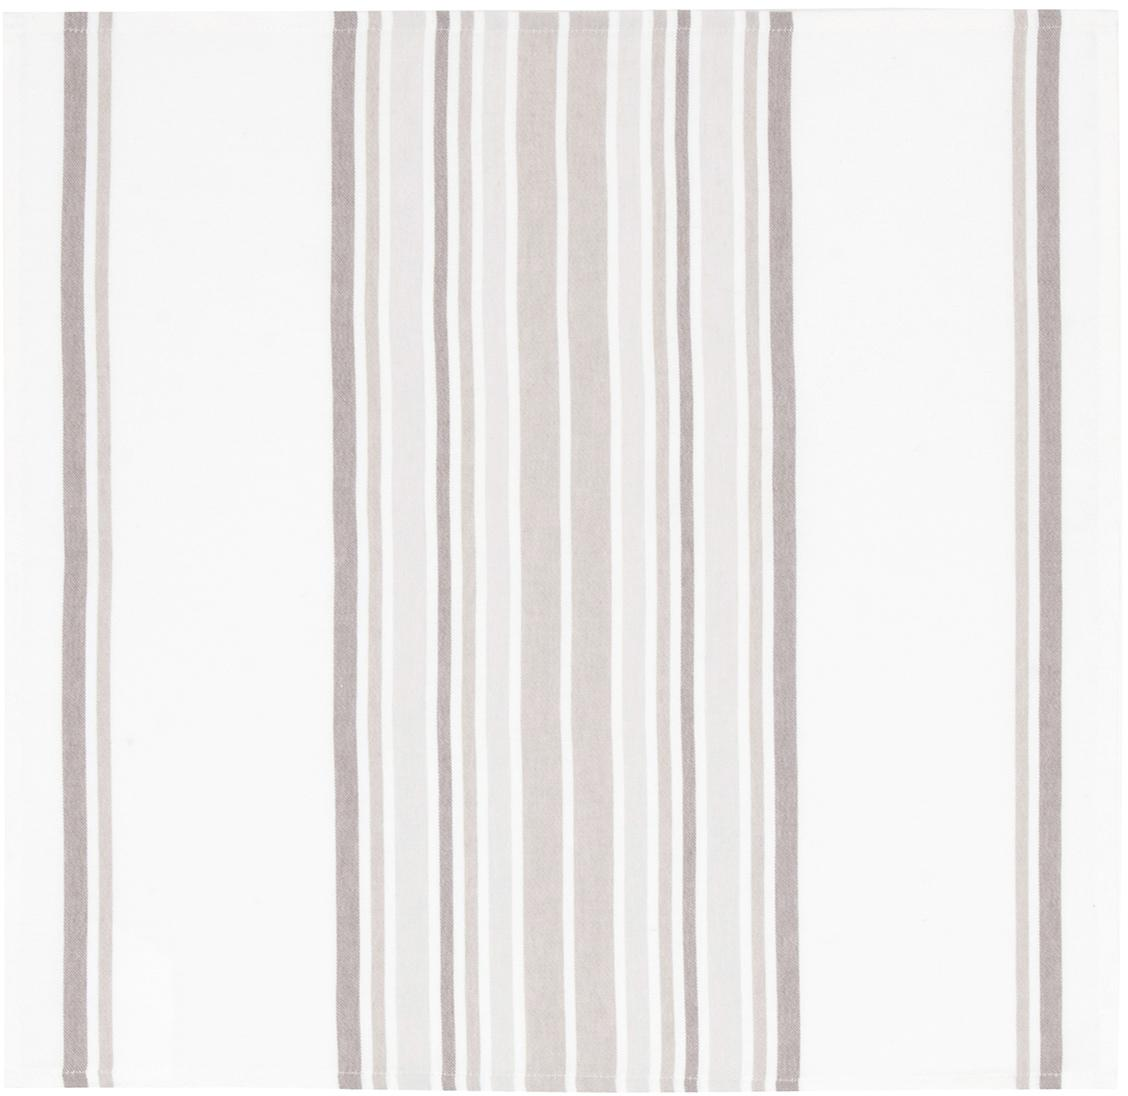 Servilletas de algodón Katie, 2uds., Algodón, Blanco, beige, An 50 x L 50 cm